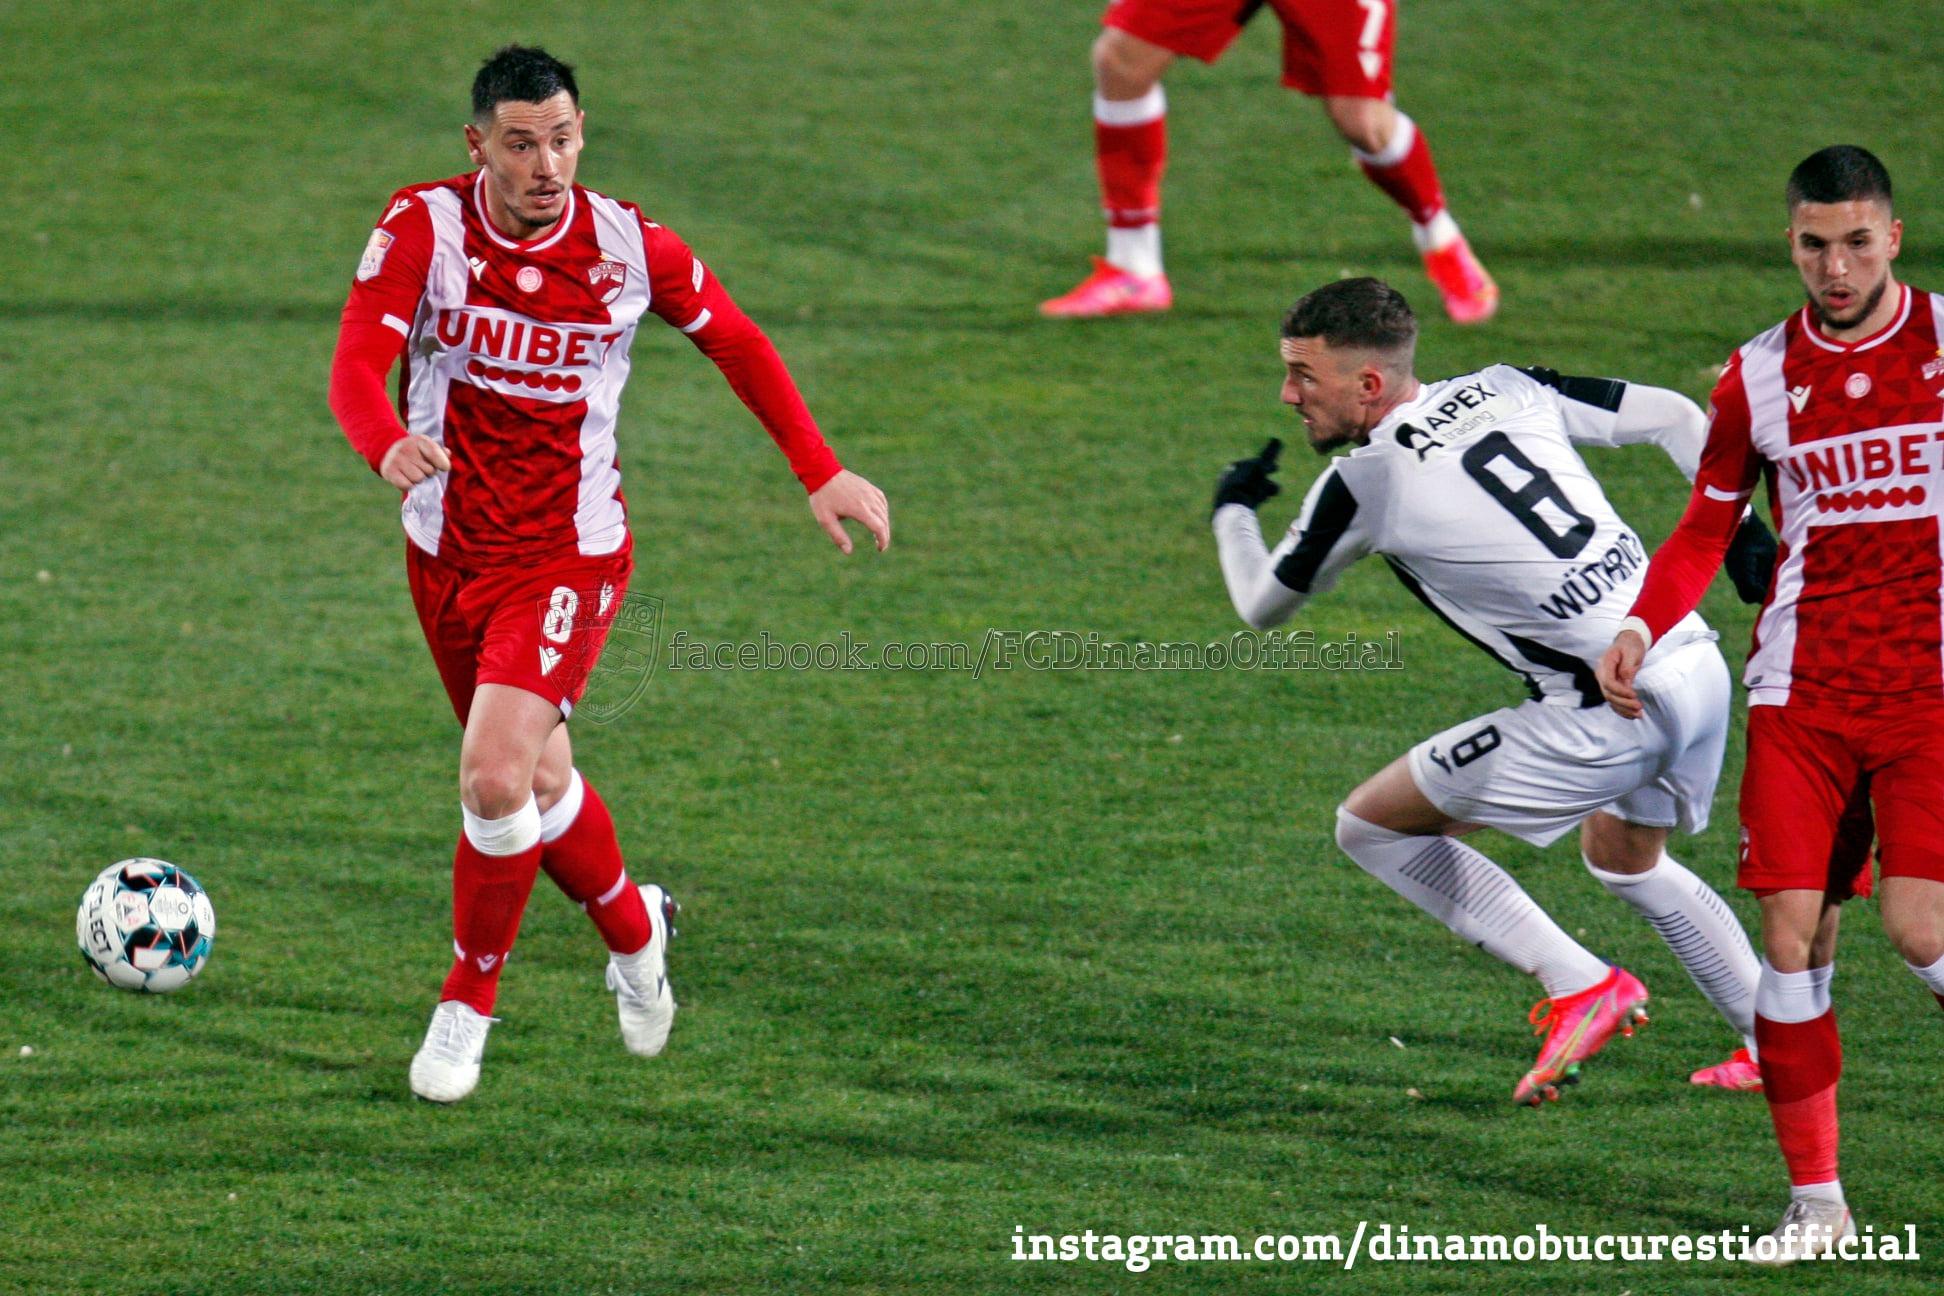 Dinamo2 1